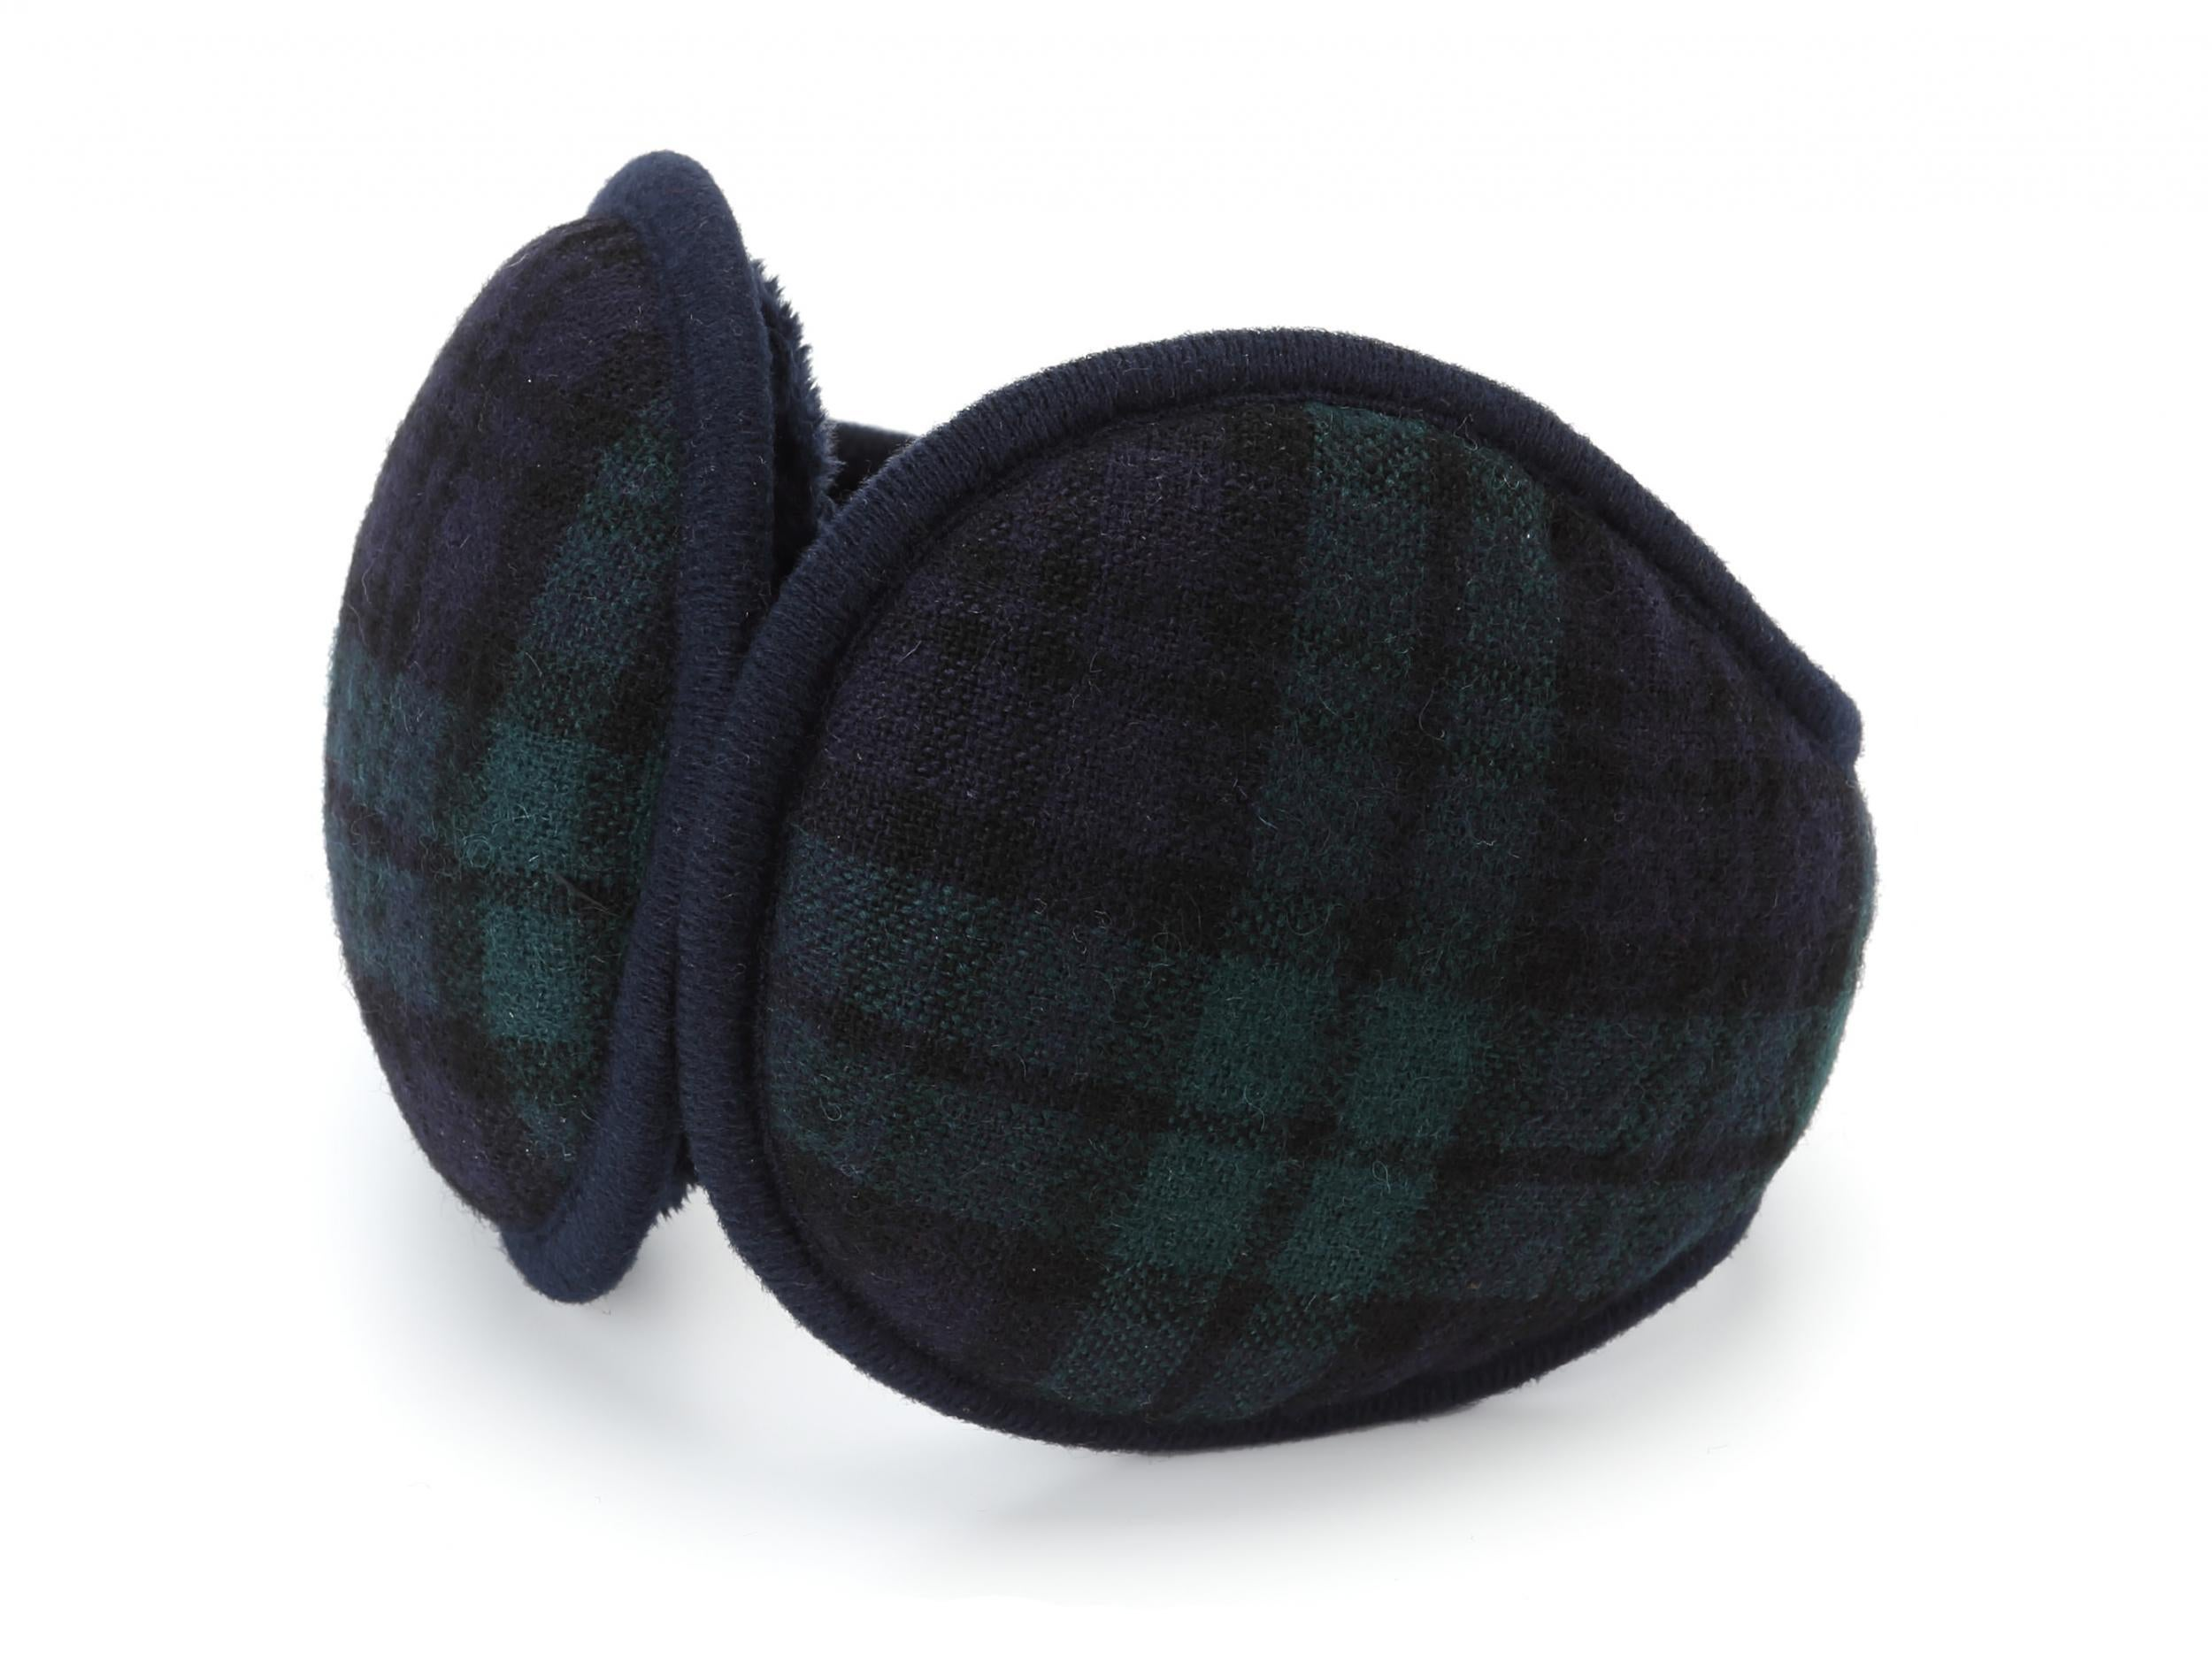 Bridge Soccer Football Sports Winter Earmuffs Ear Warmers Faux Fur Foldable Plush Outdoor Gift